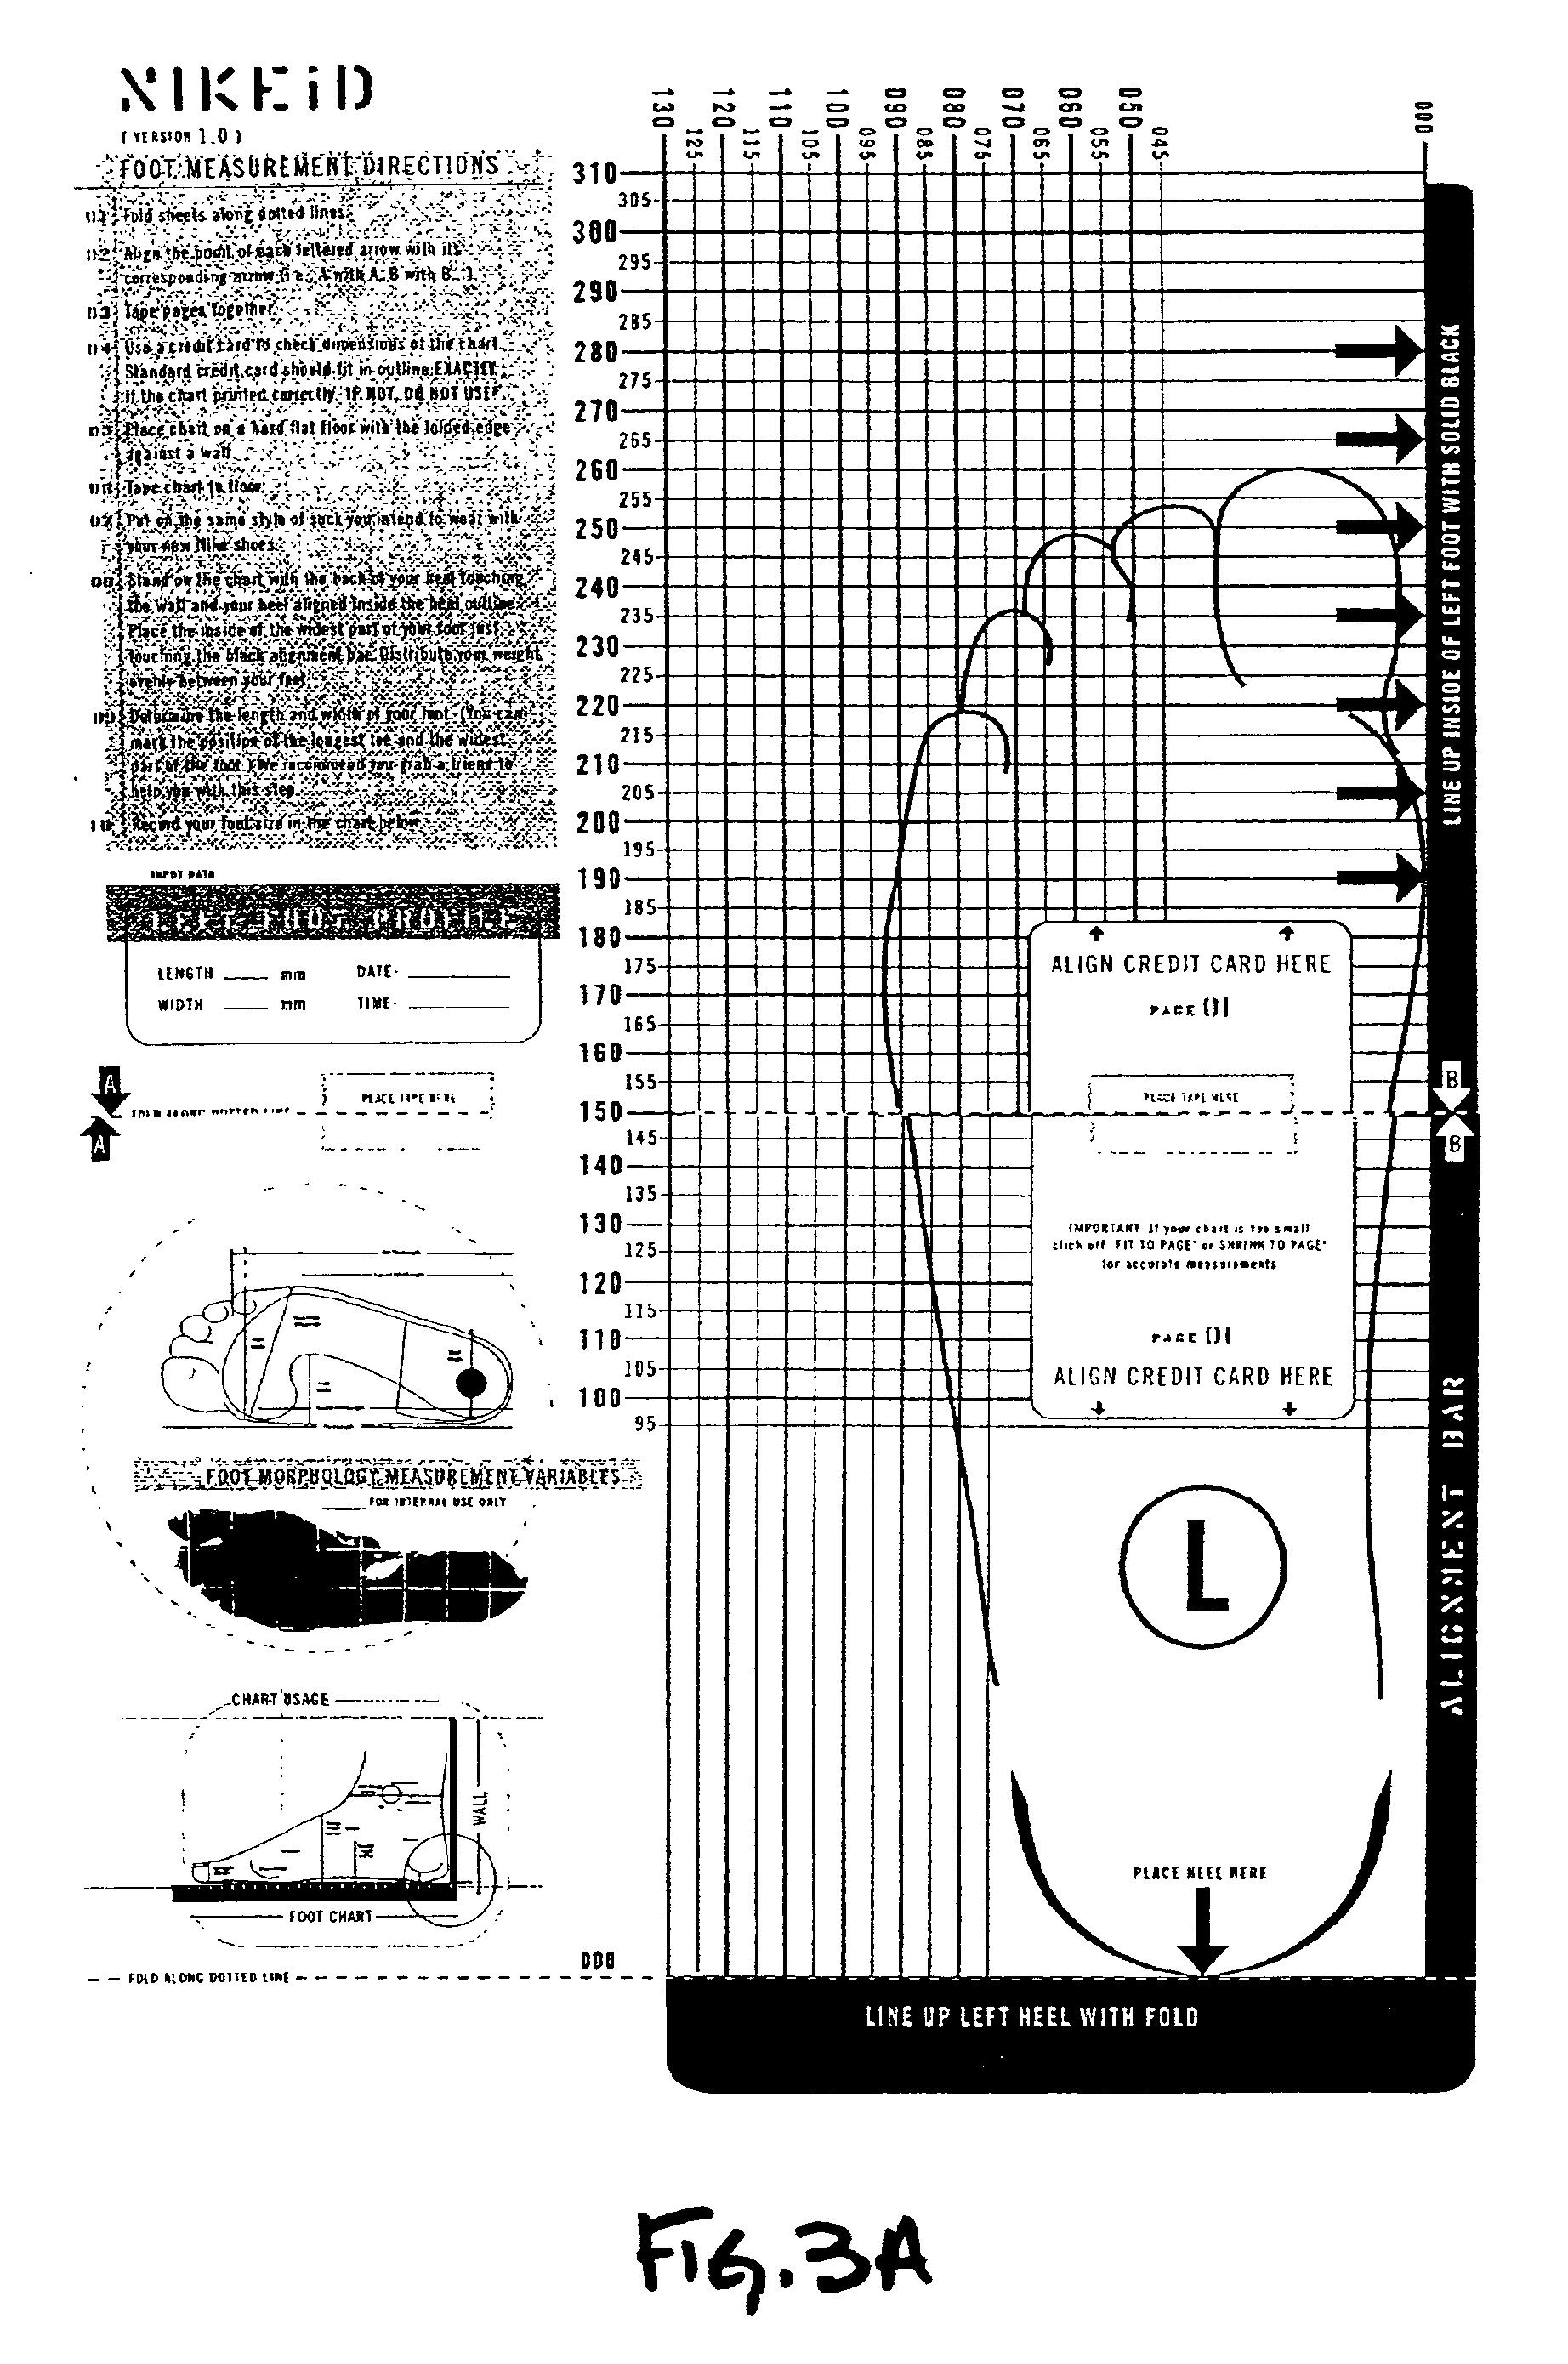 photo relating to Brannock Device Printable titled Printable Brannock Machine Width Very similar Key phrases